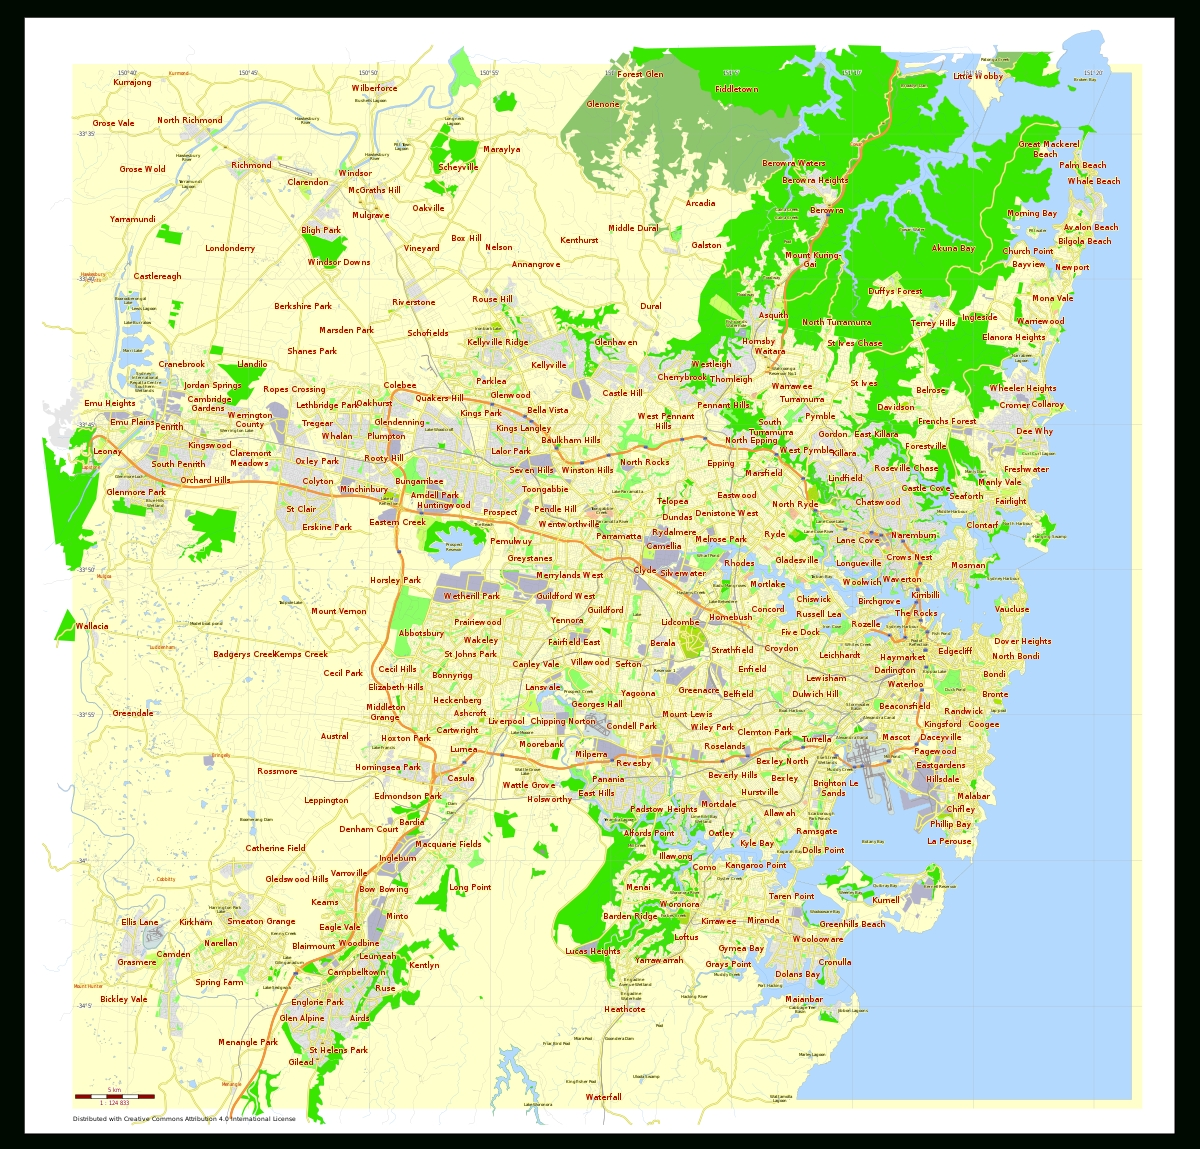 Sydney - Wikipedia throughout Map Of Perth Australia Suburbs